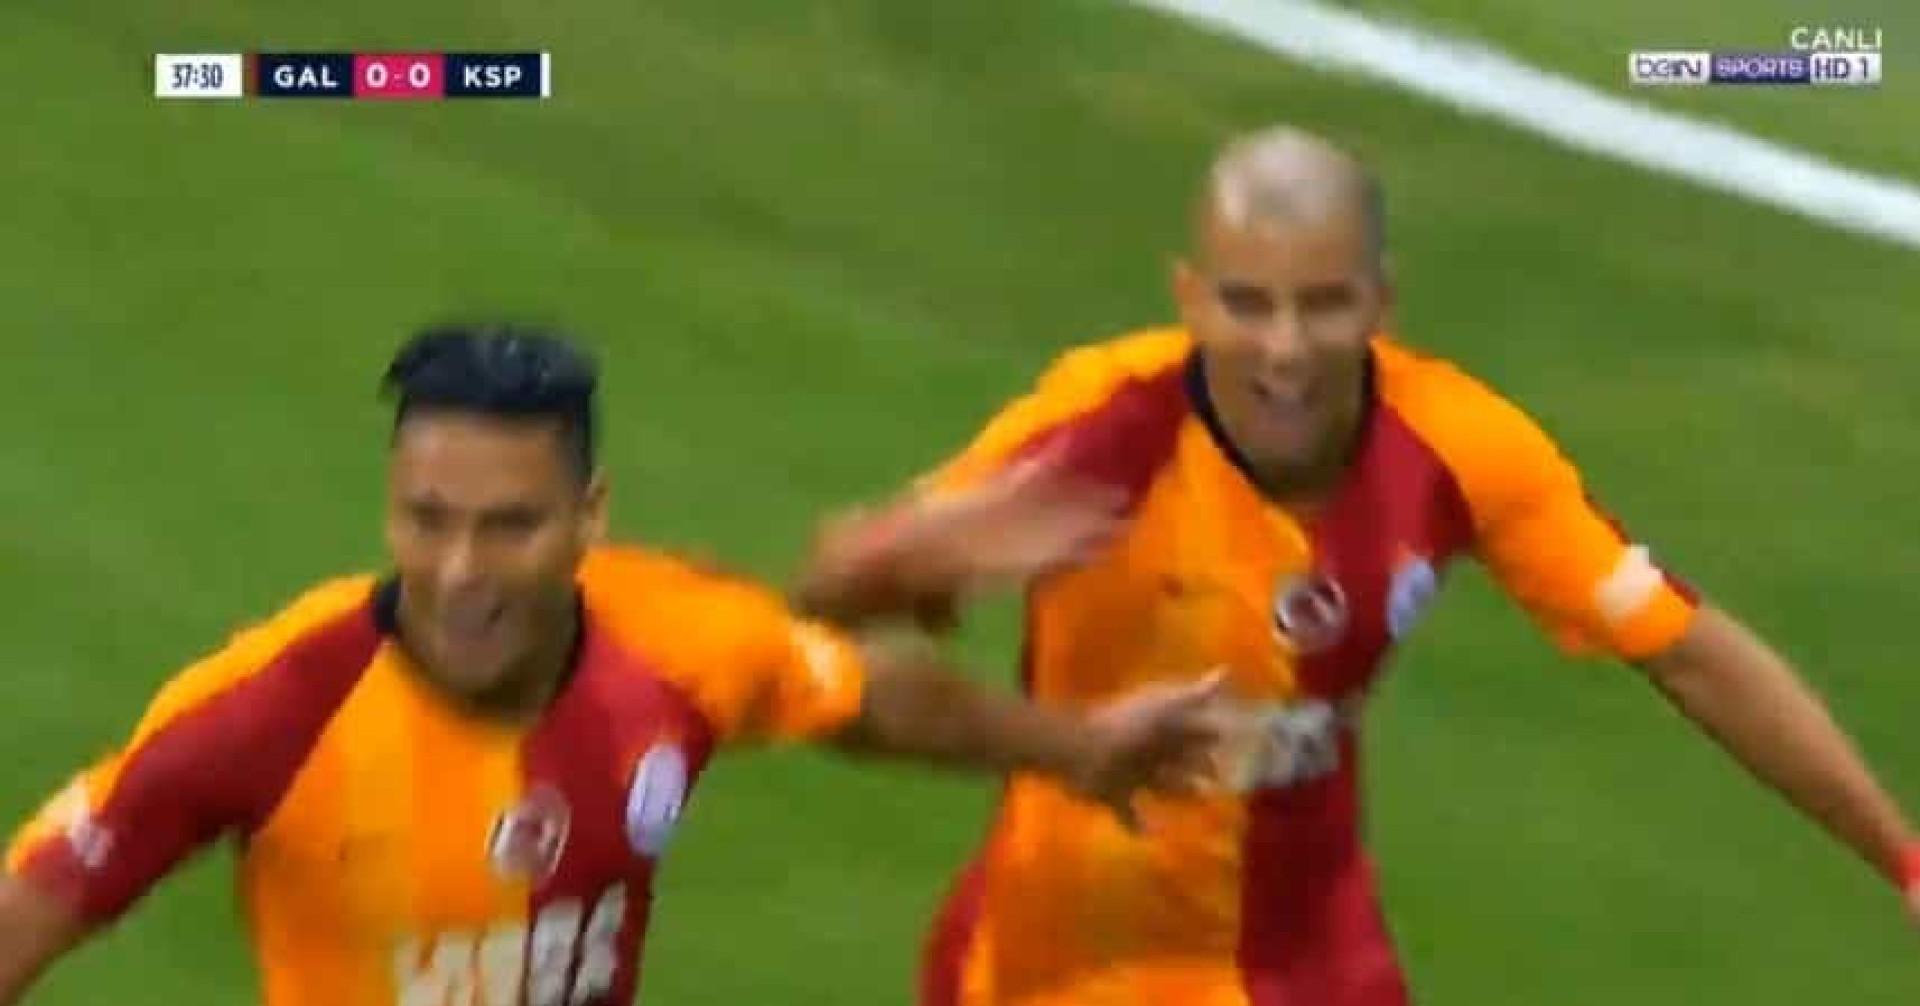 Falcao precisou de 38 minutos para fazer o primeiro golo no Galatasaray